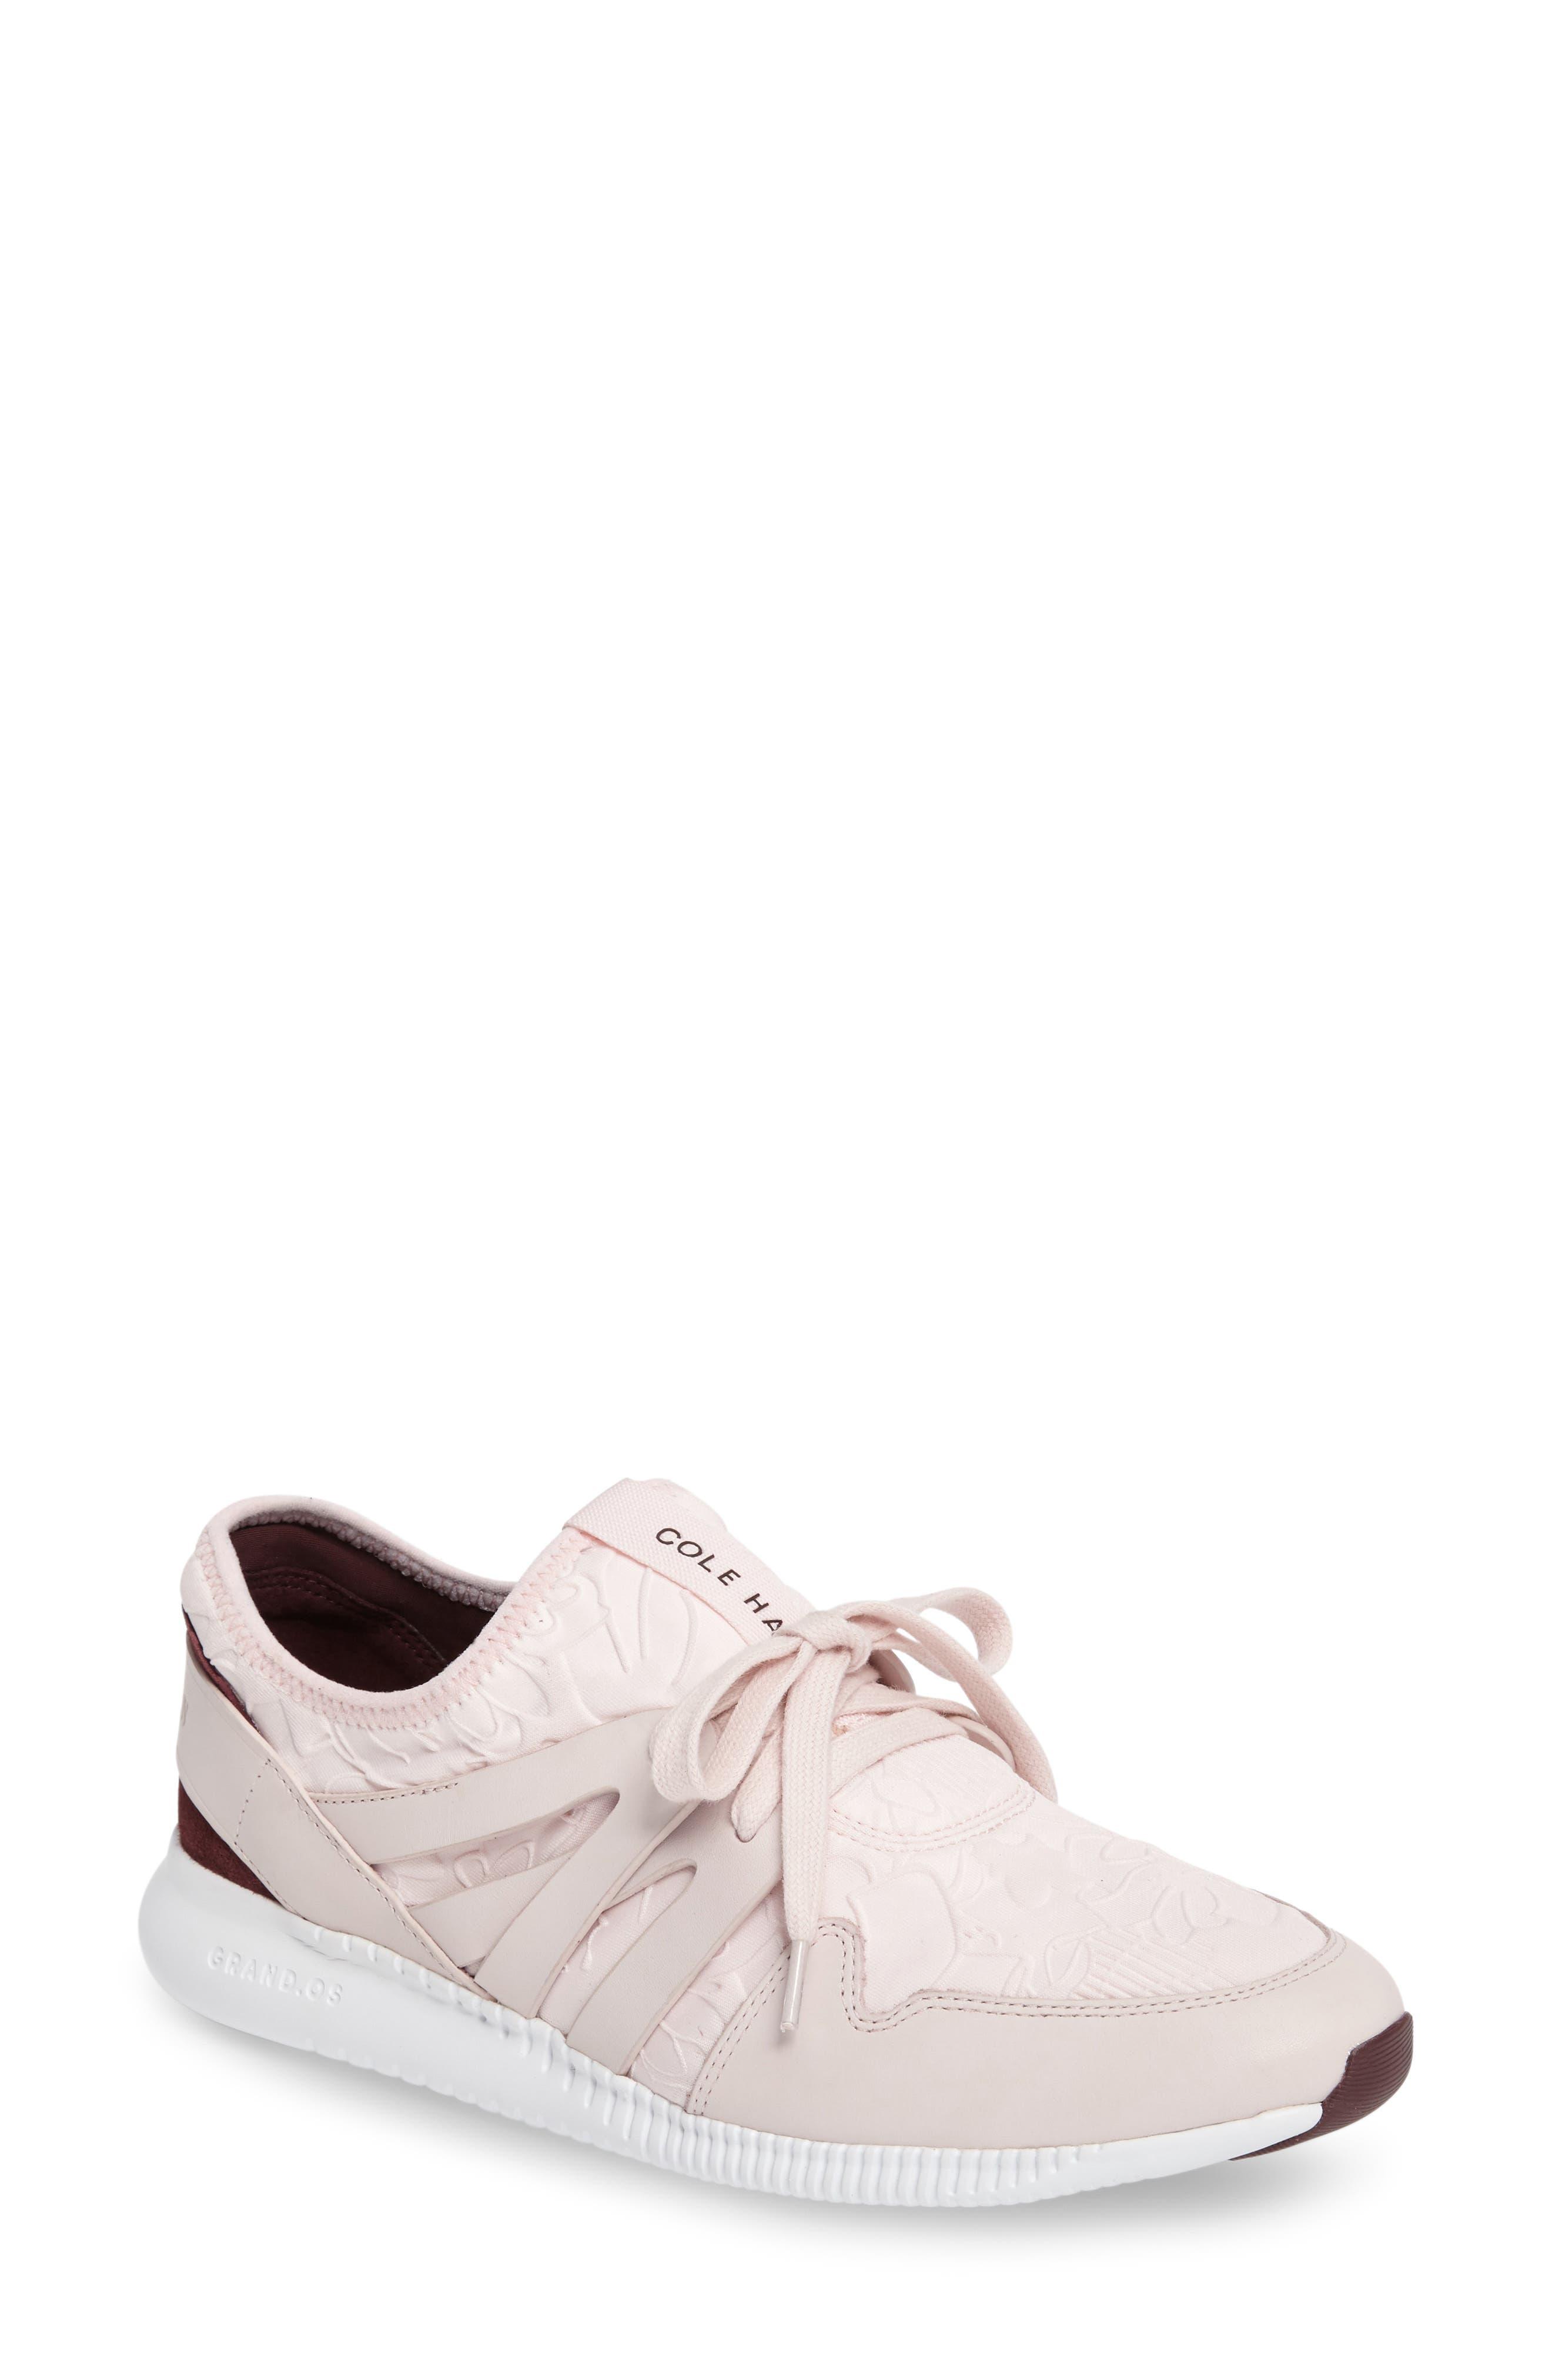 Alternate Image 1 Selected - Cole Haan 'StudioGrand' Sneaker (Women)